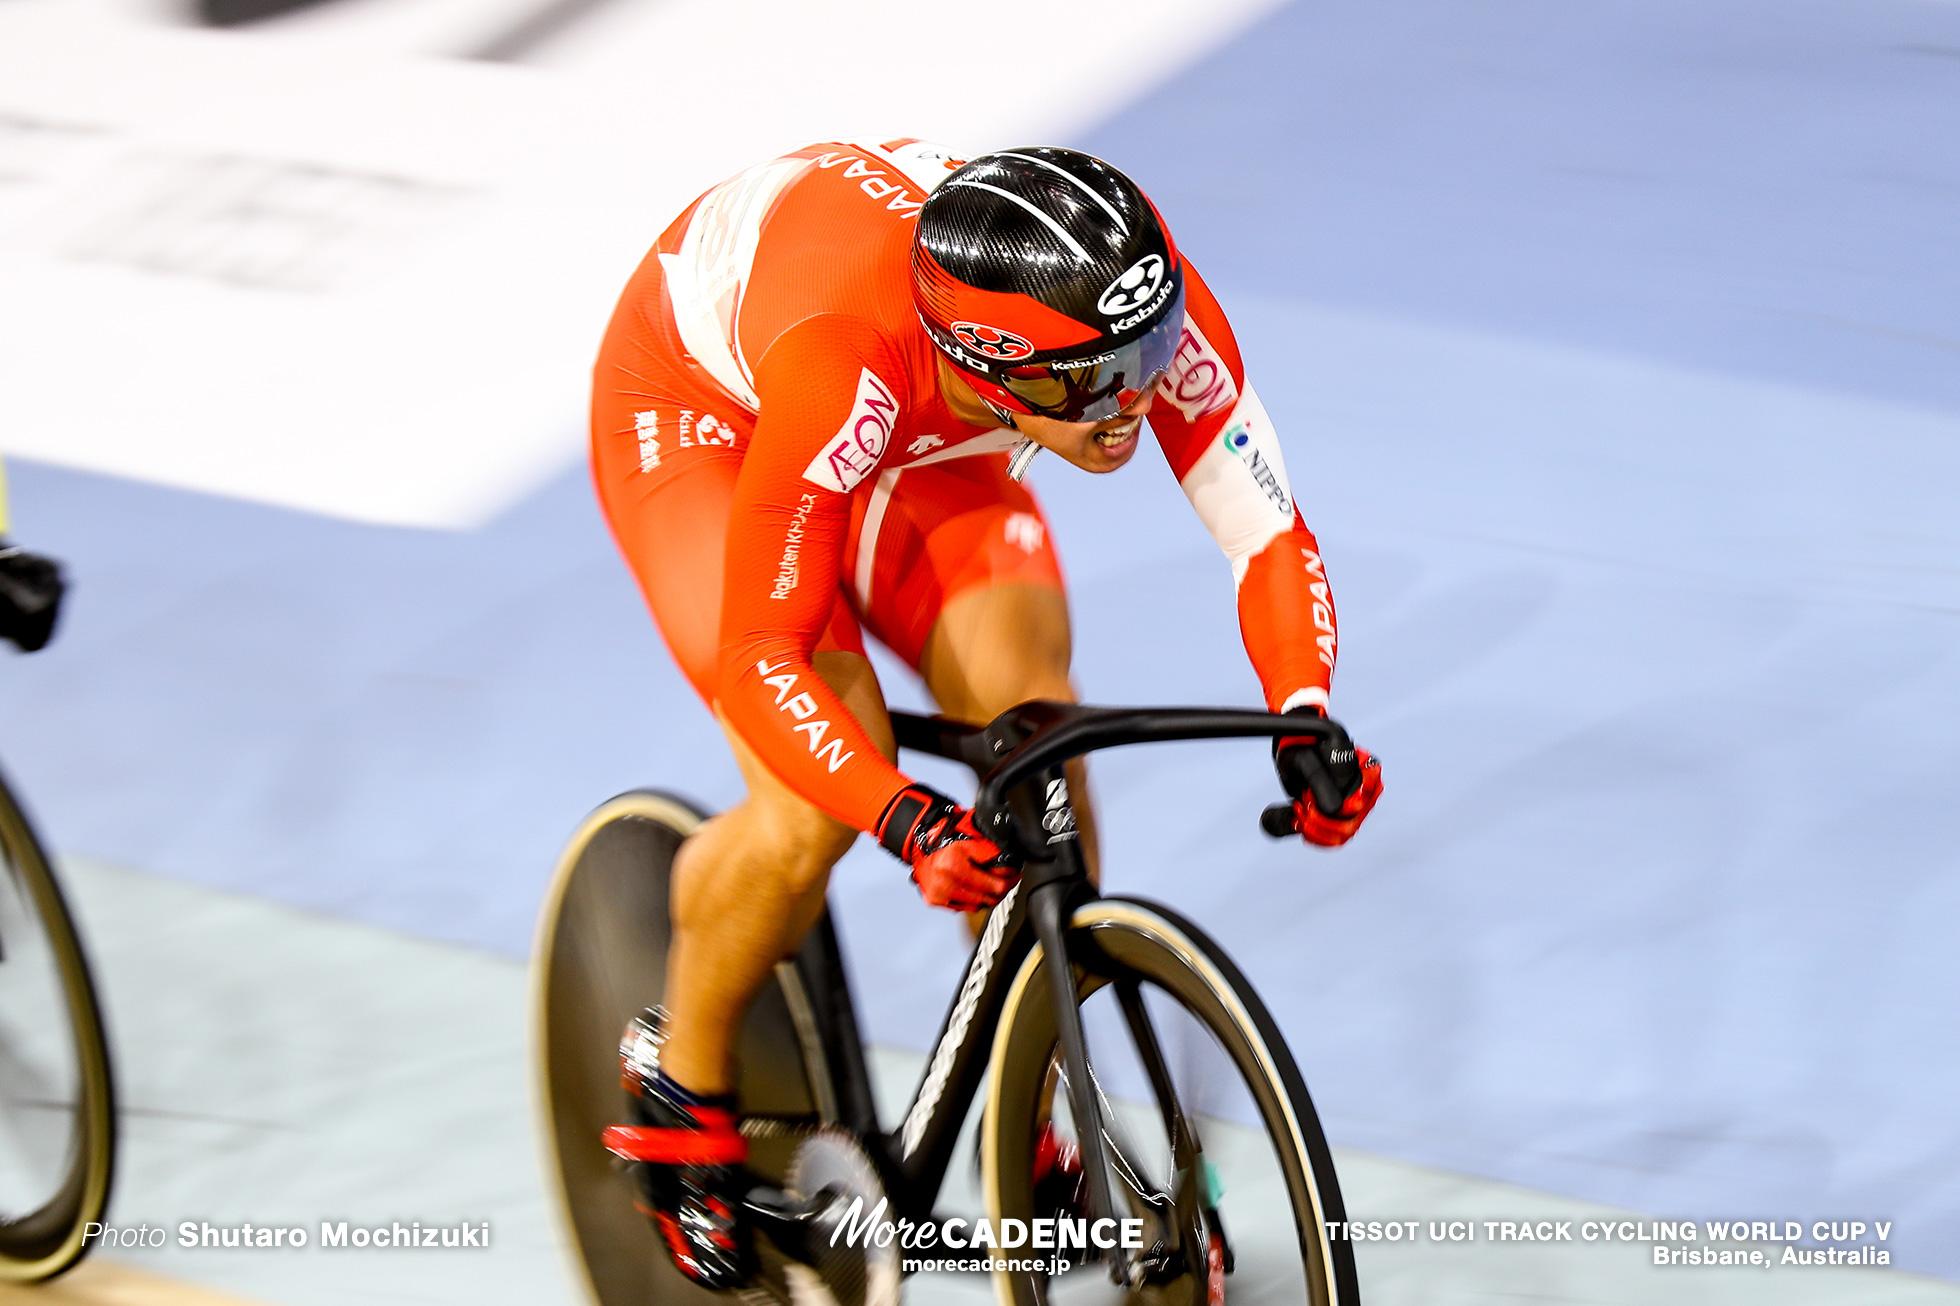 Final / Men's Keirin / TISSOT UCI TRACK CYCLING WORLD CUP V, Brisbane, Australia, 脇本雄太